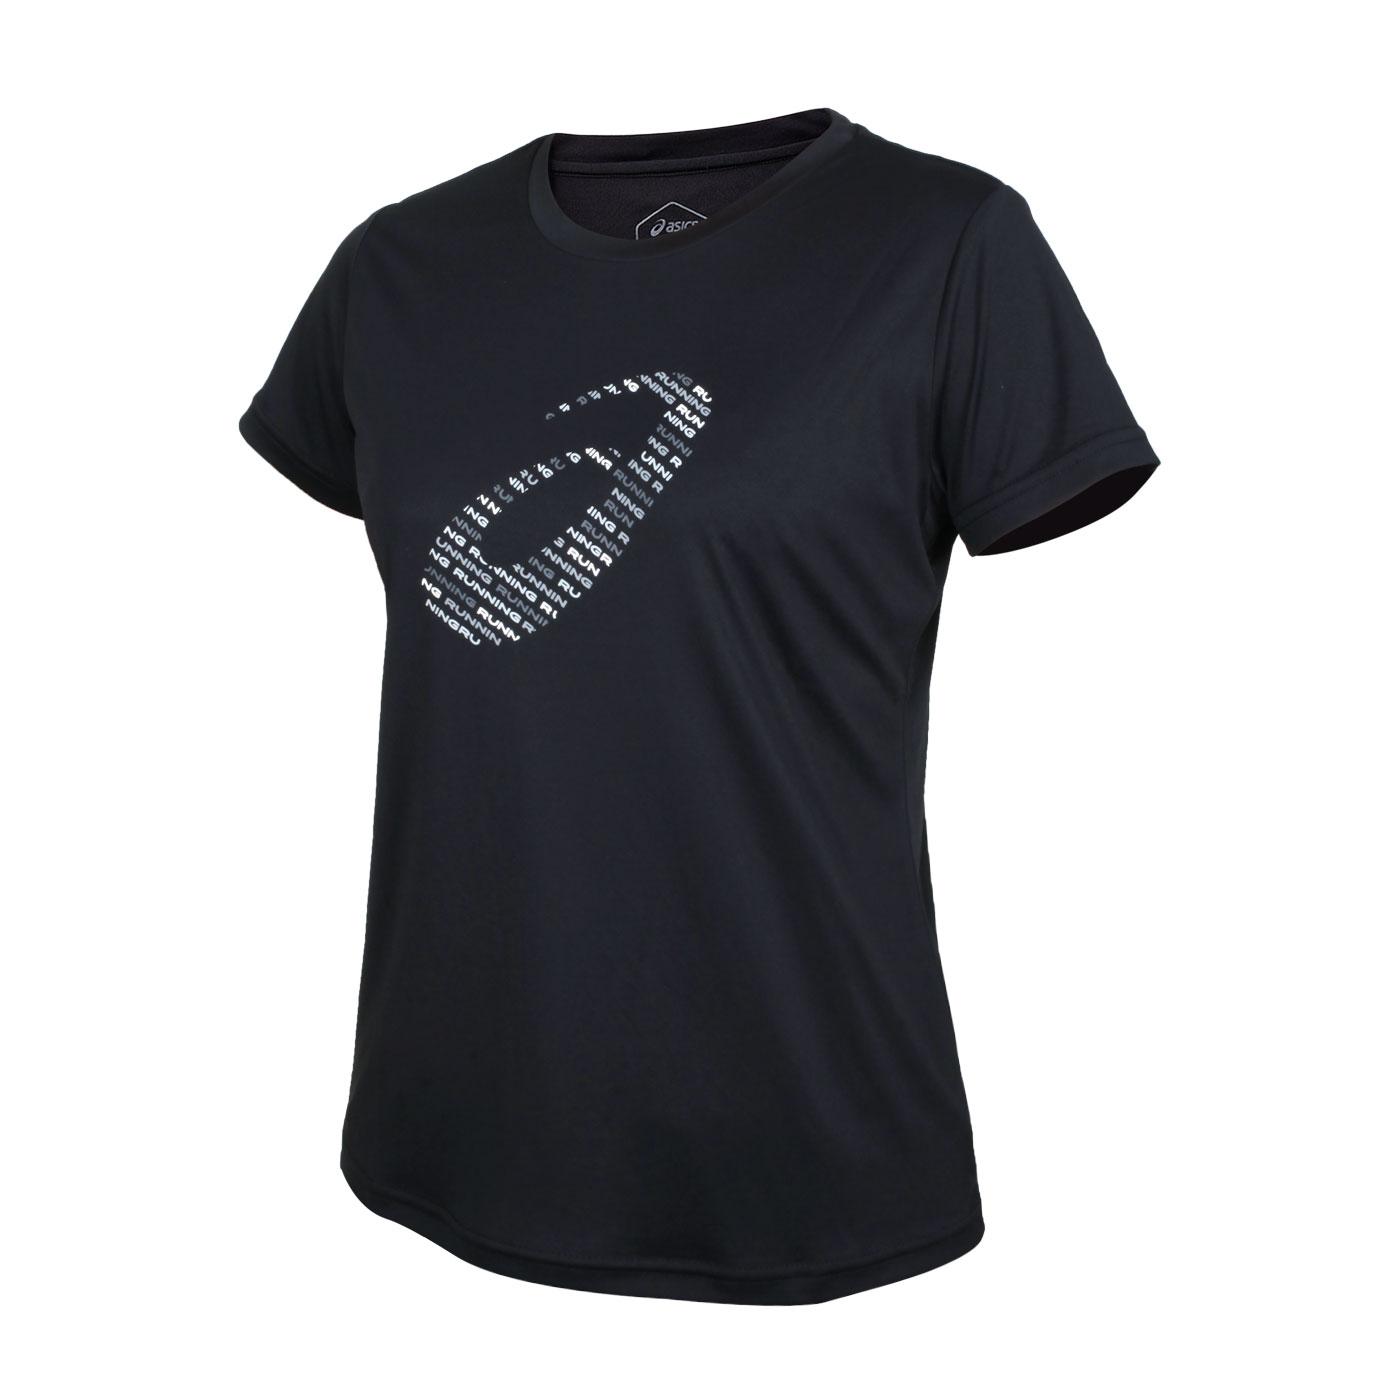 ASICS 女款短袖T恤 2012C345-001